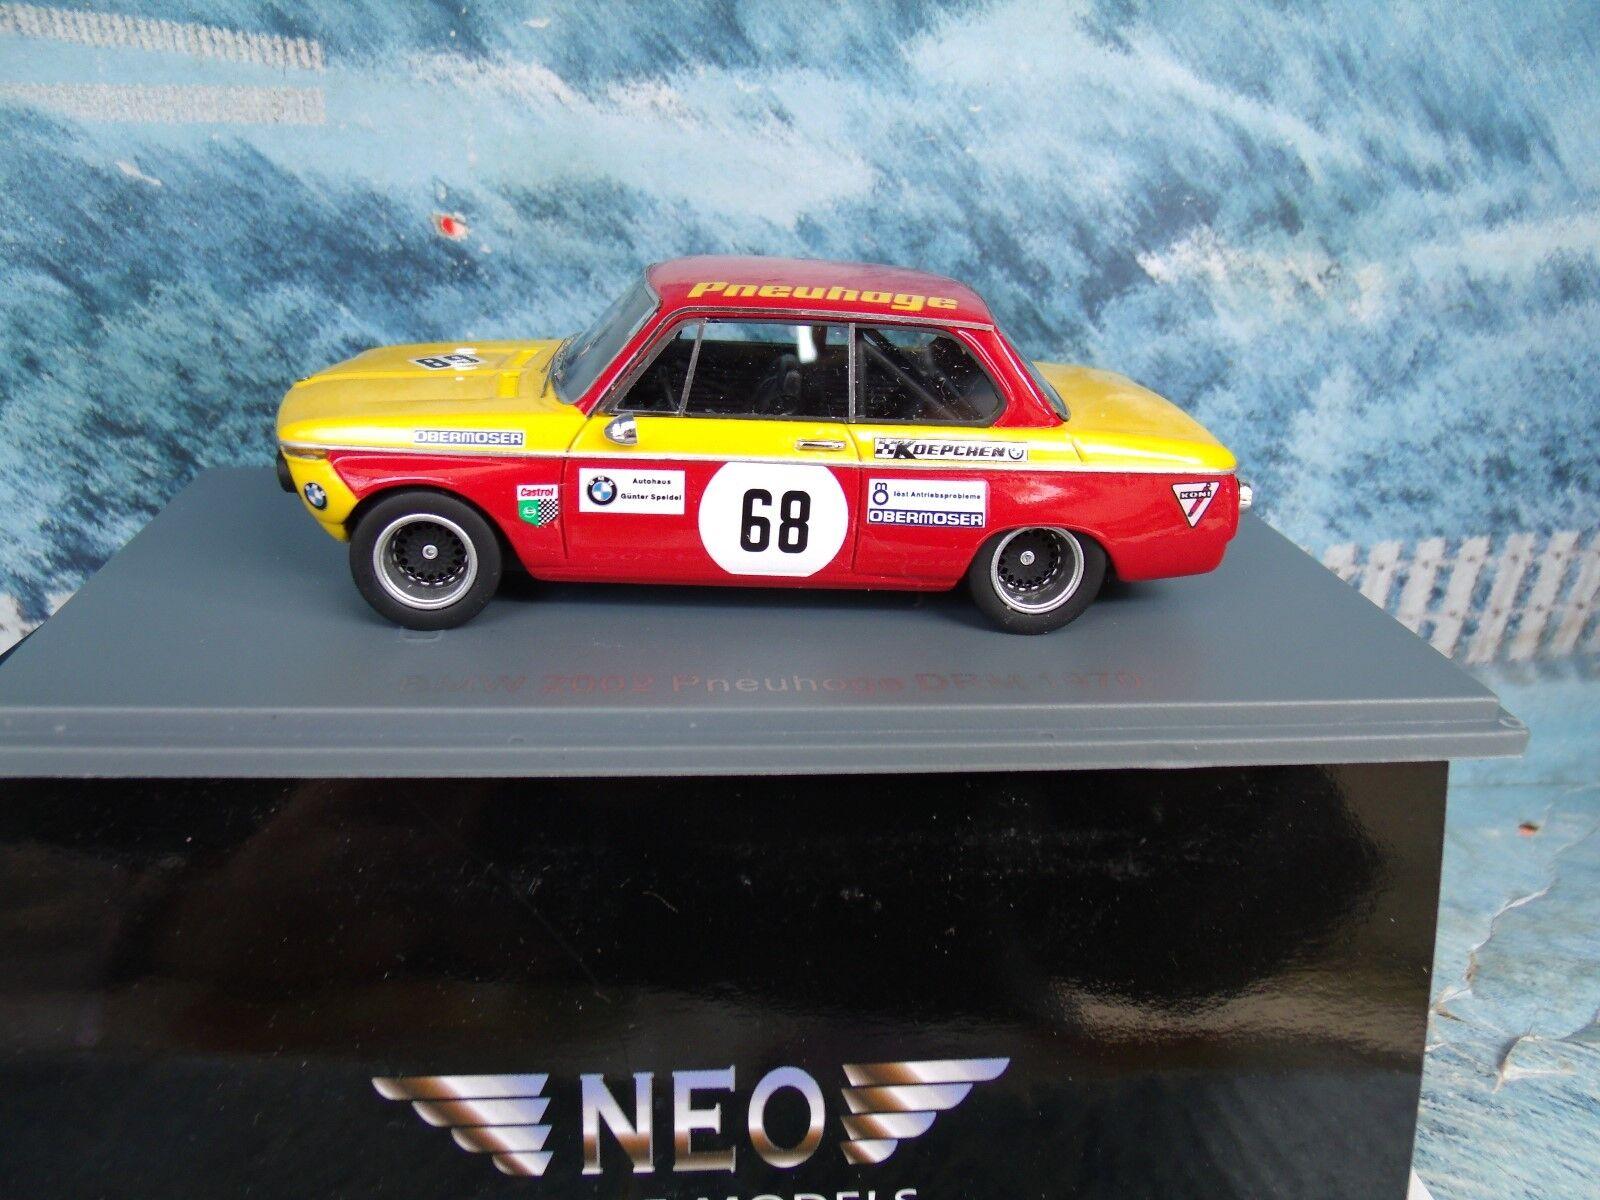 NEO BMW 2002 PNEUHEGE DRM 1970